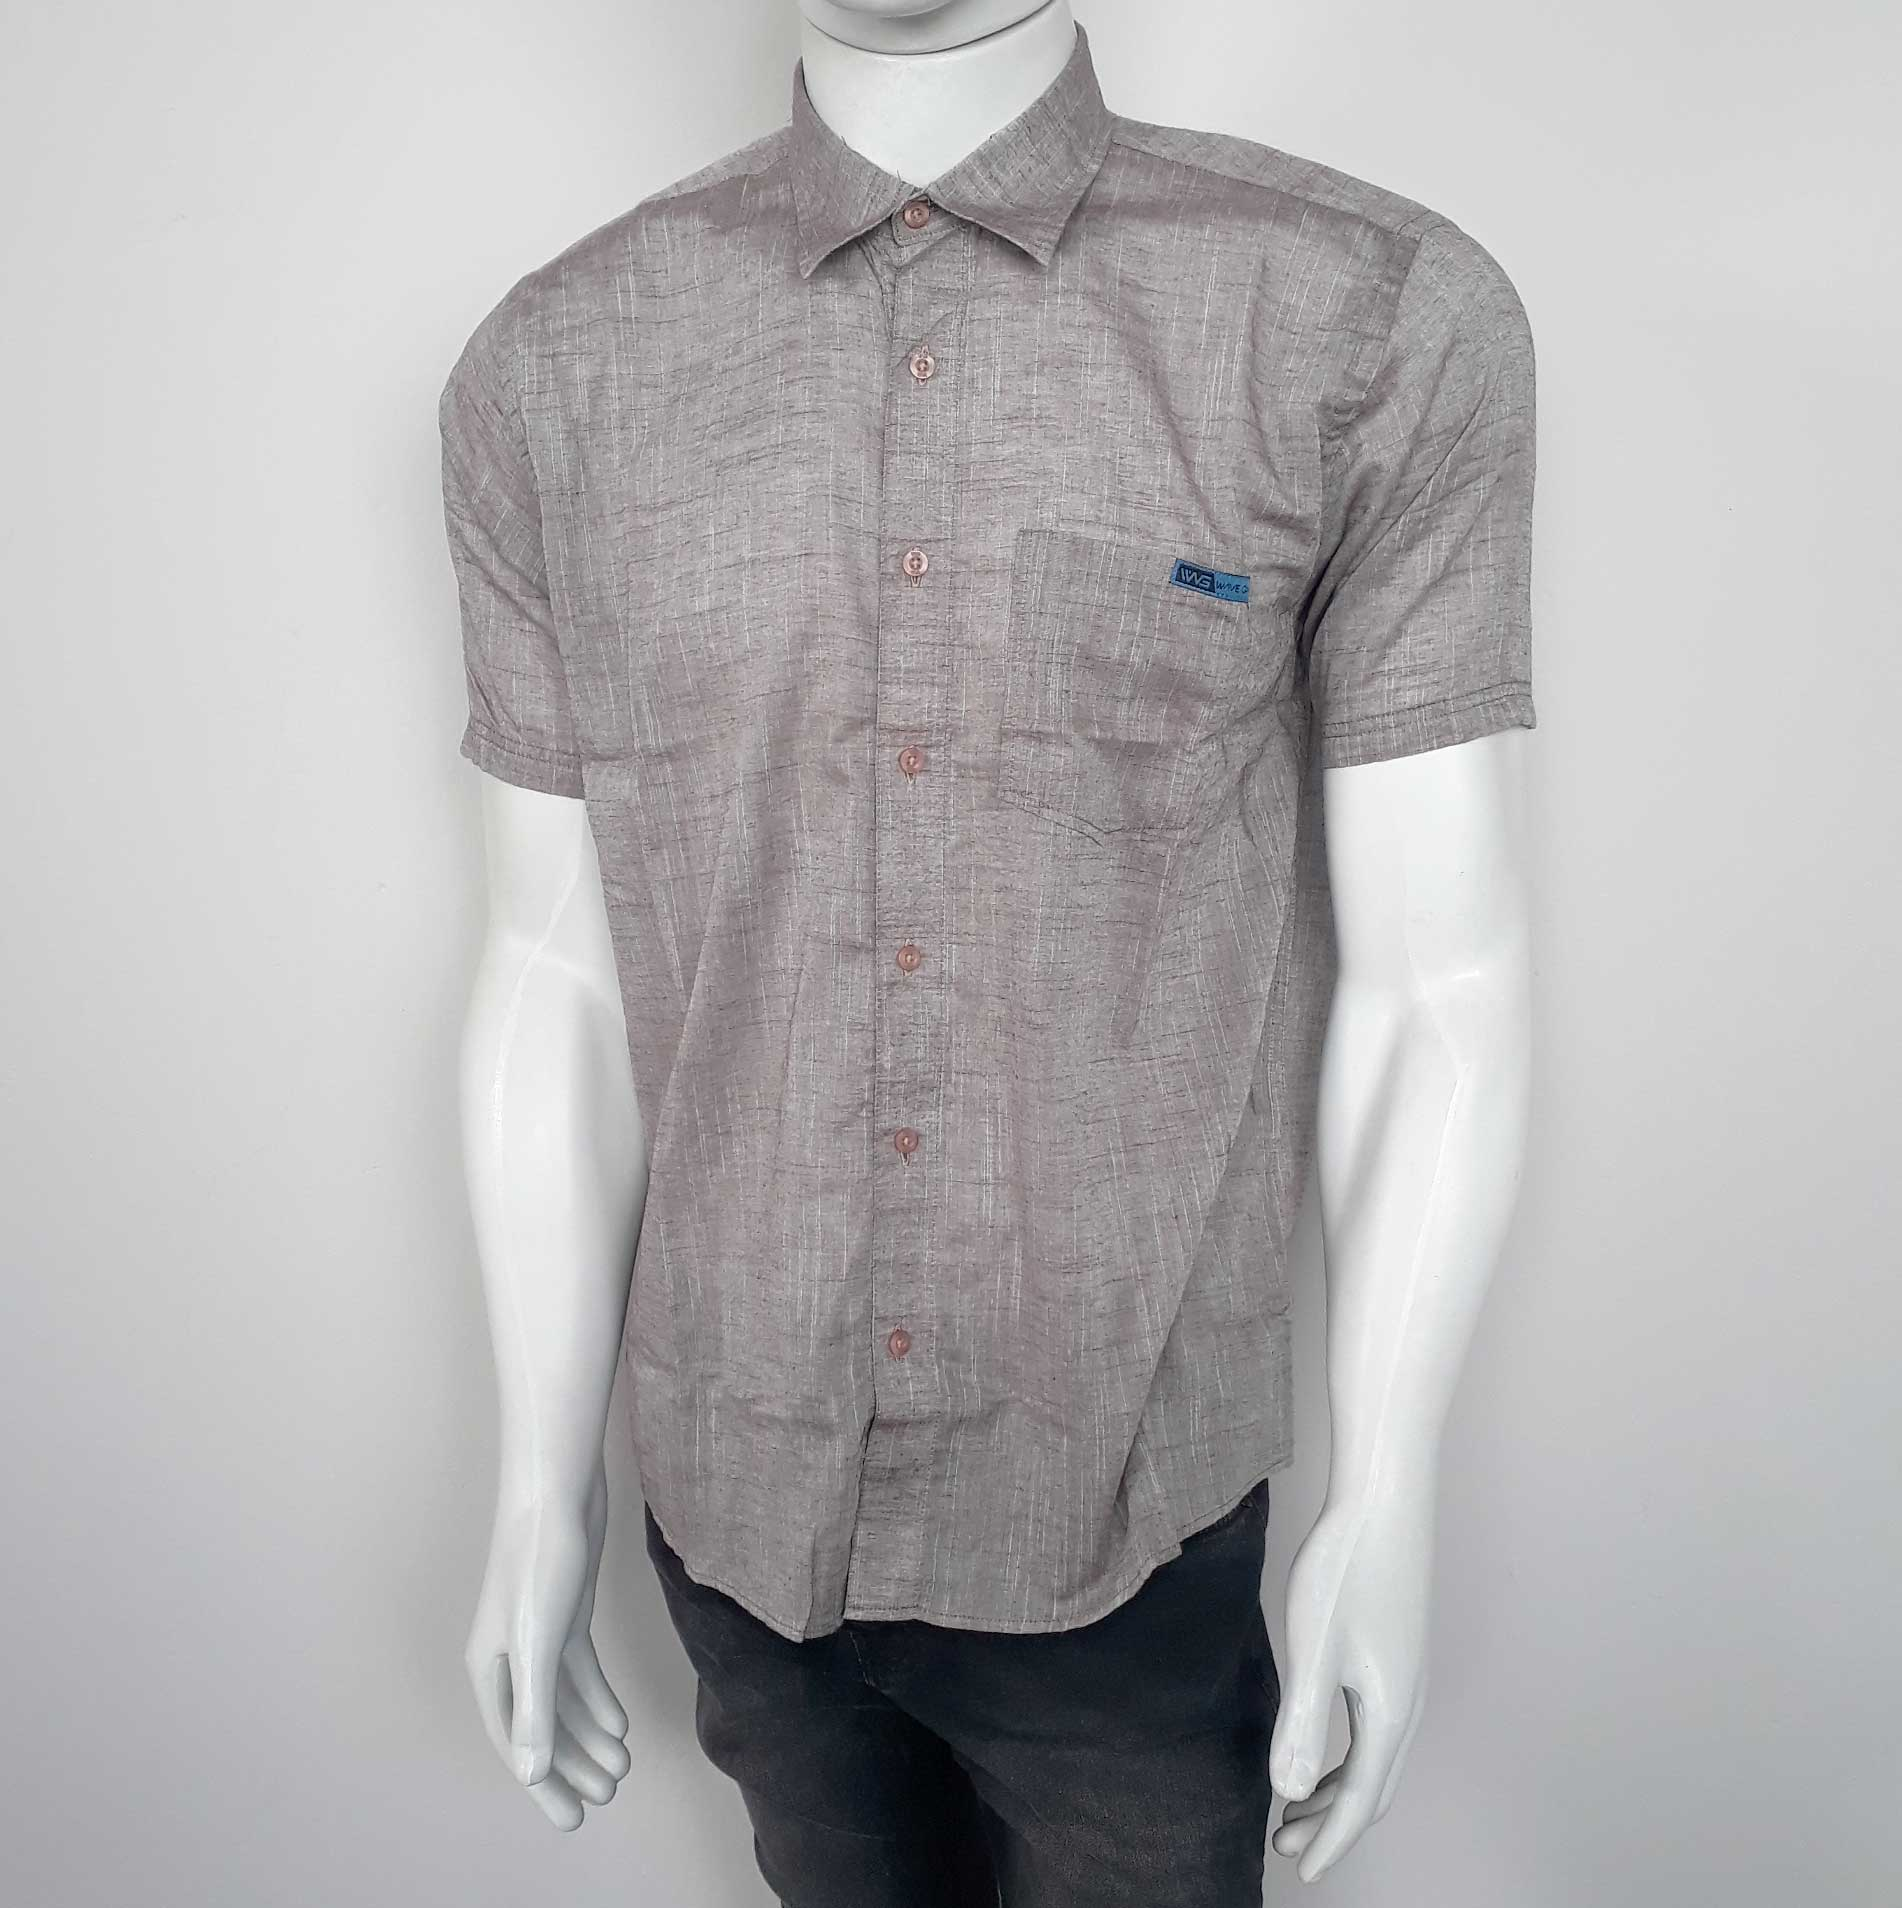 Camisa WG MC 324252 Marrom - GG